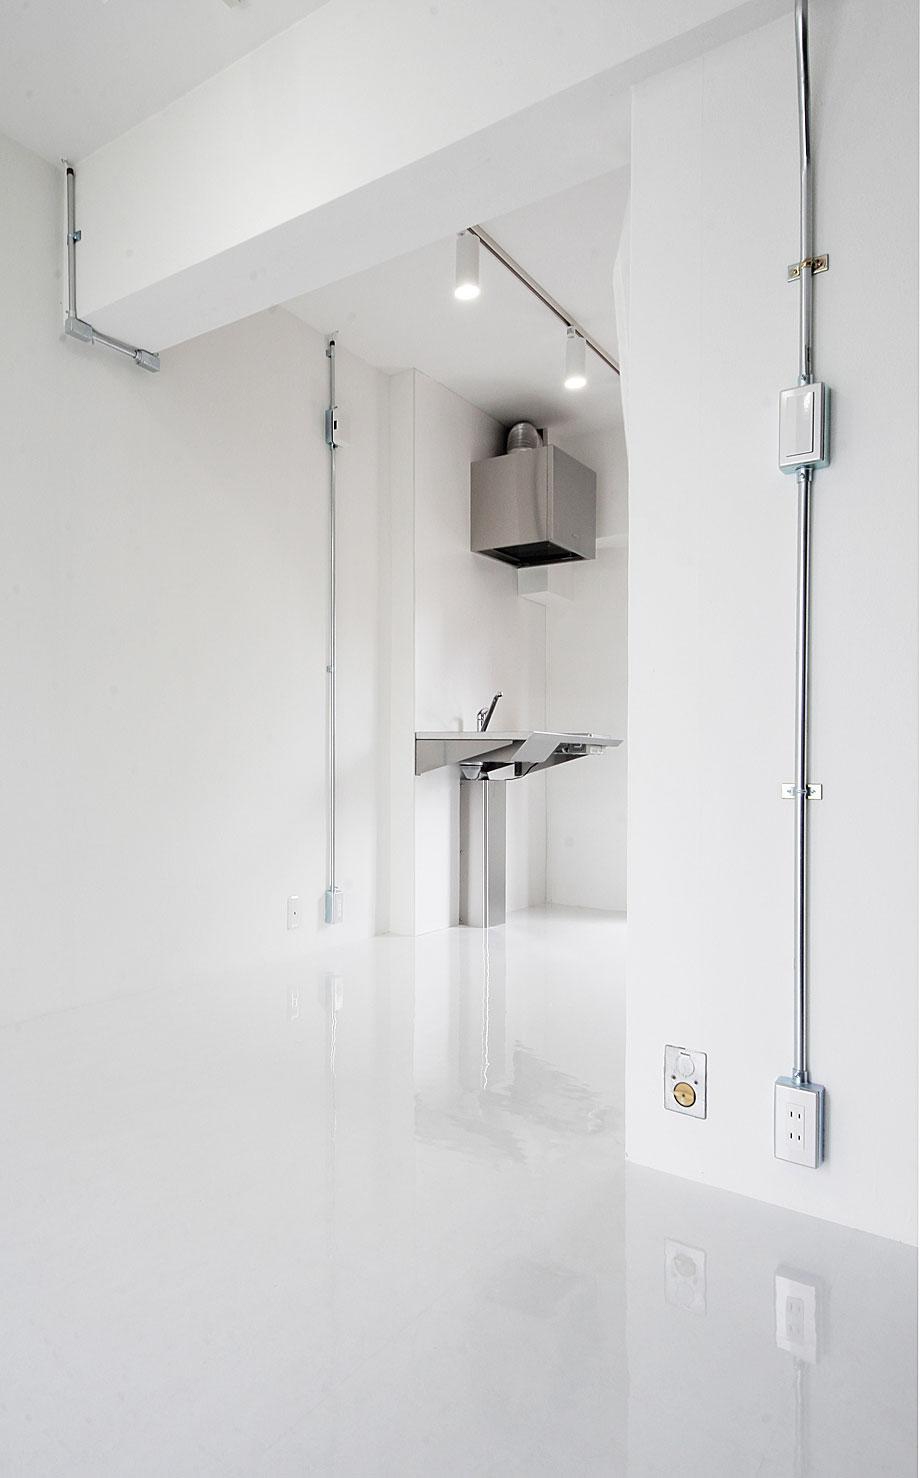 apartamento-osaka-japon-jun-murata-12